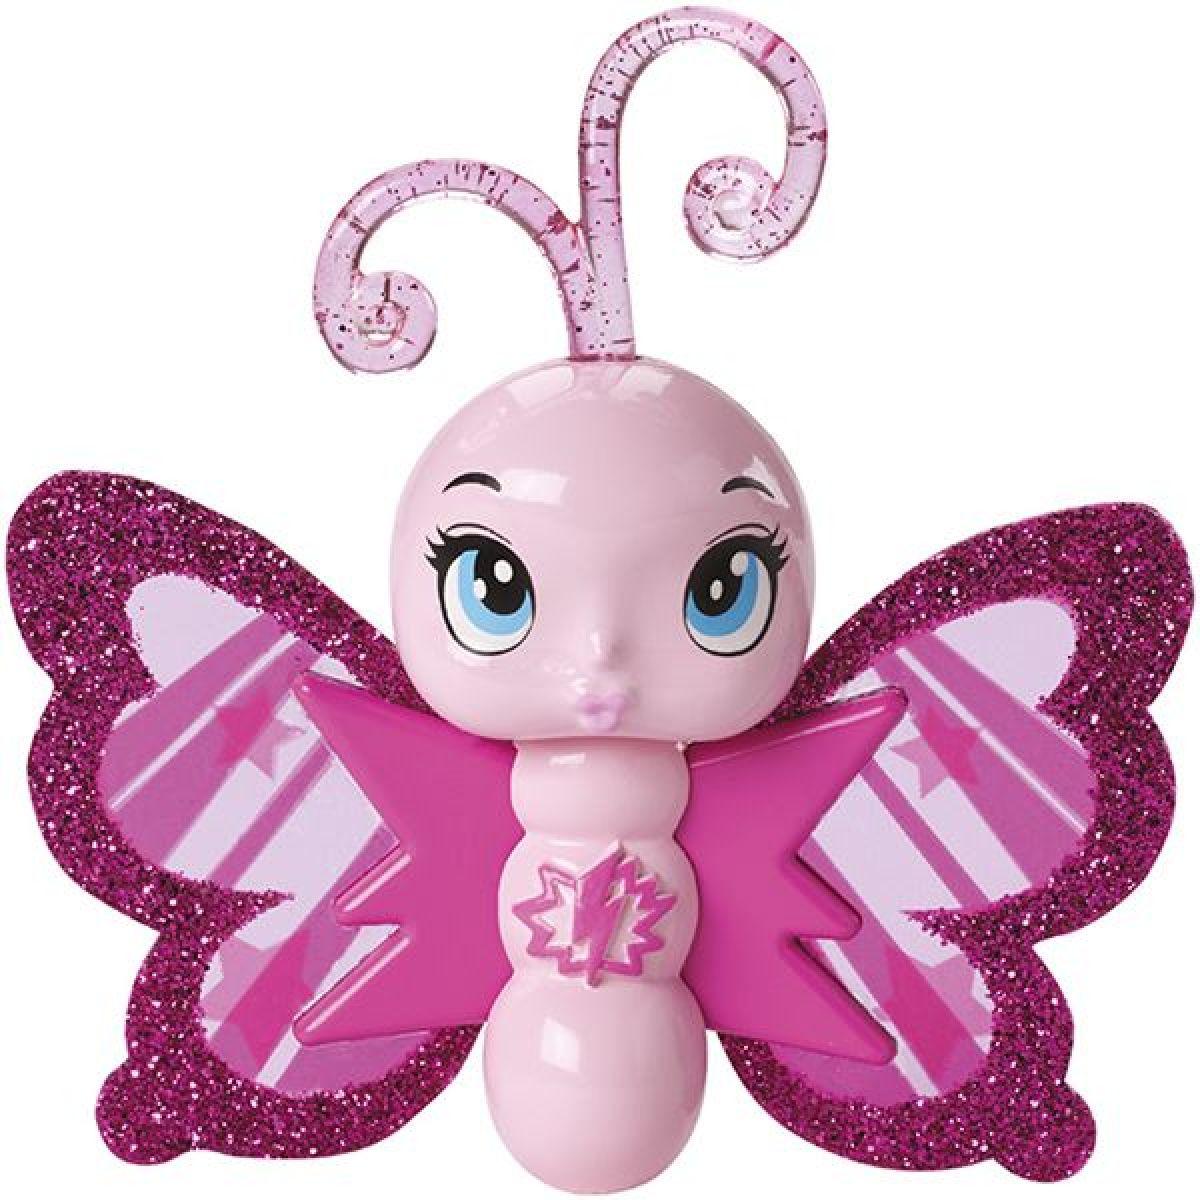 Barbie superzvířátko - Motýlek